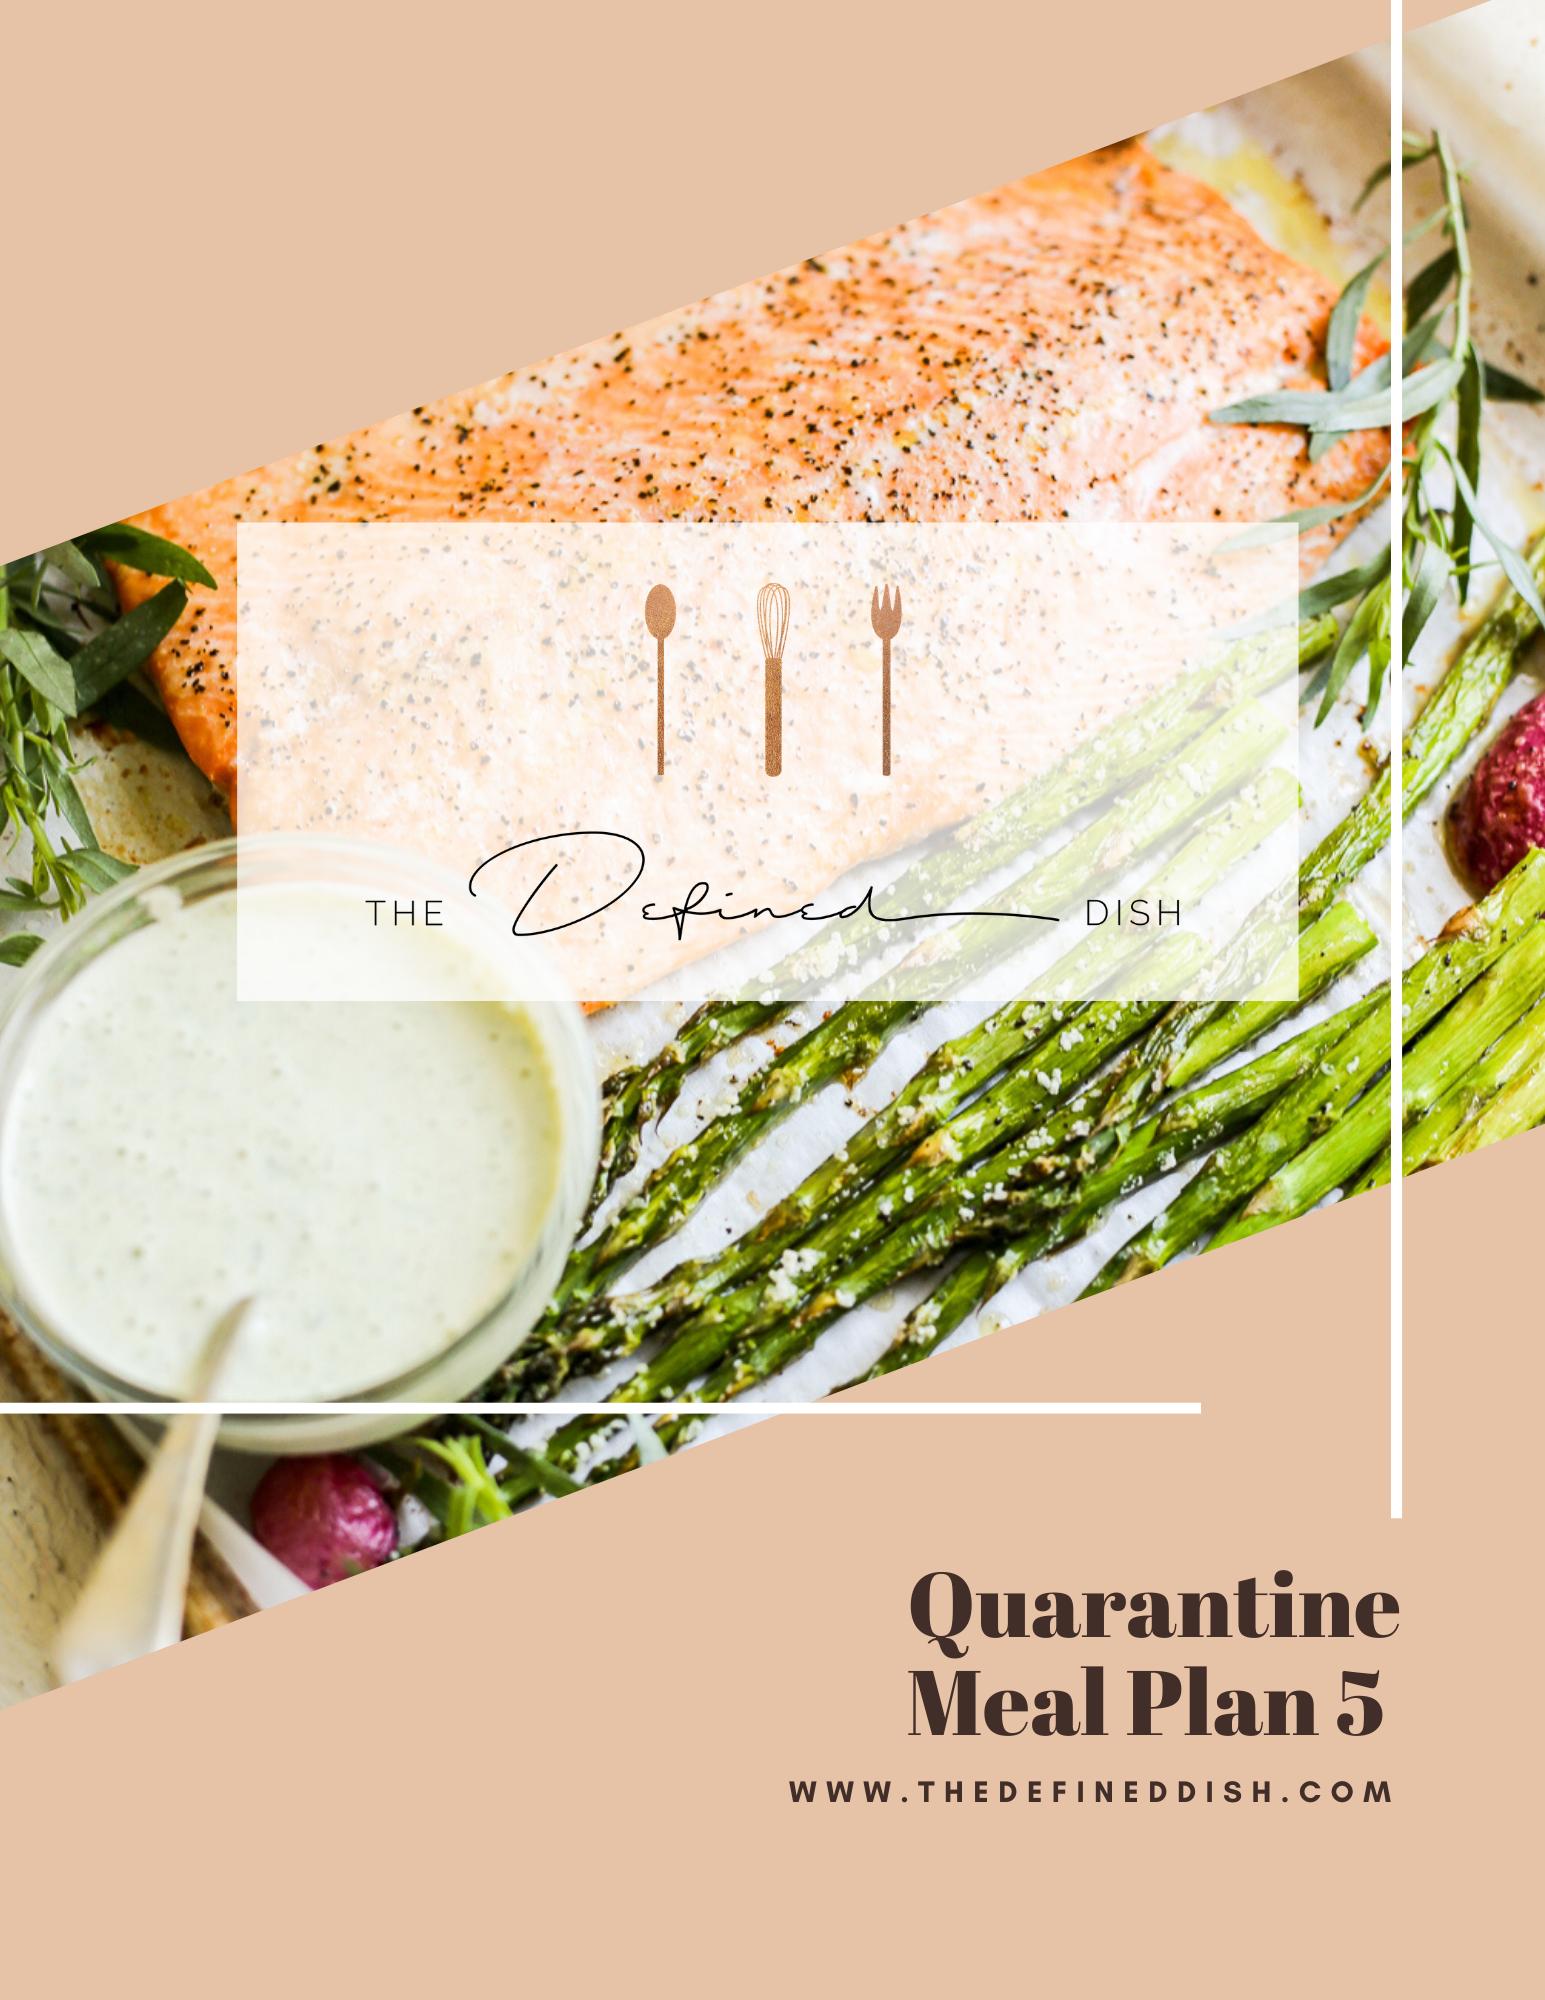 Quarantine Meal Plan 5